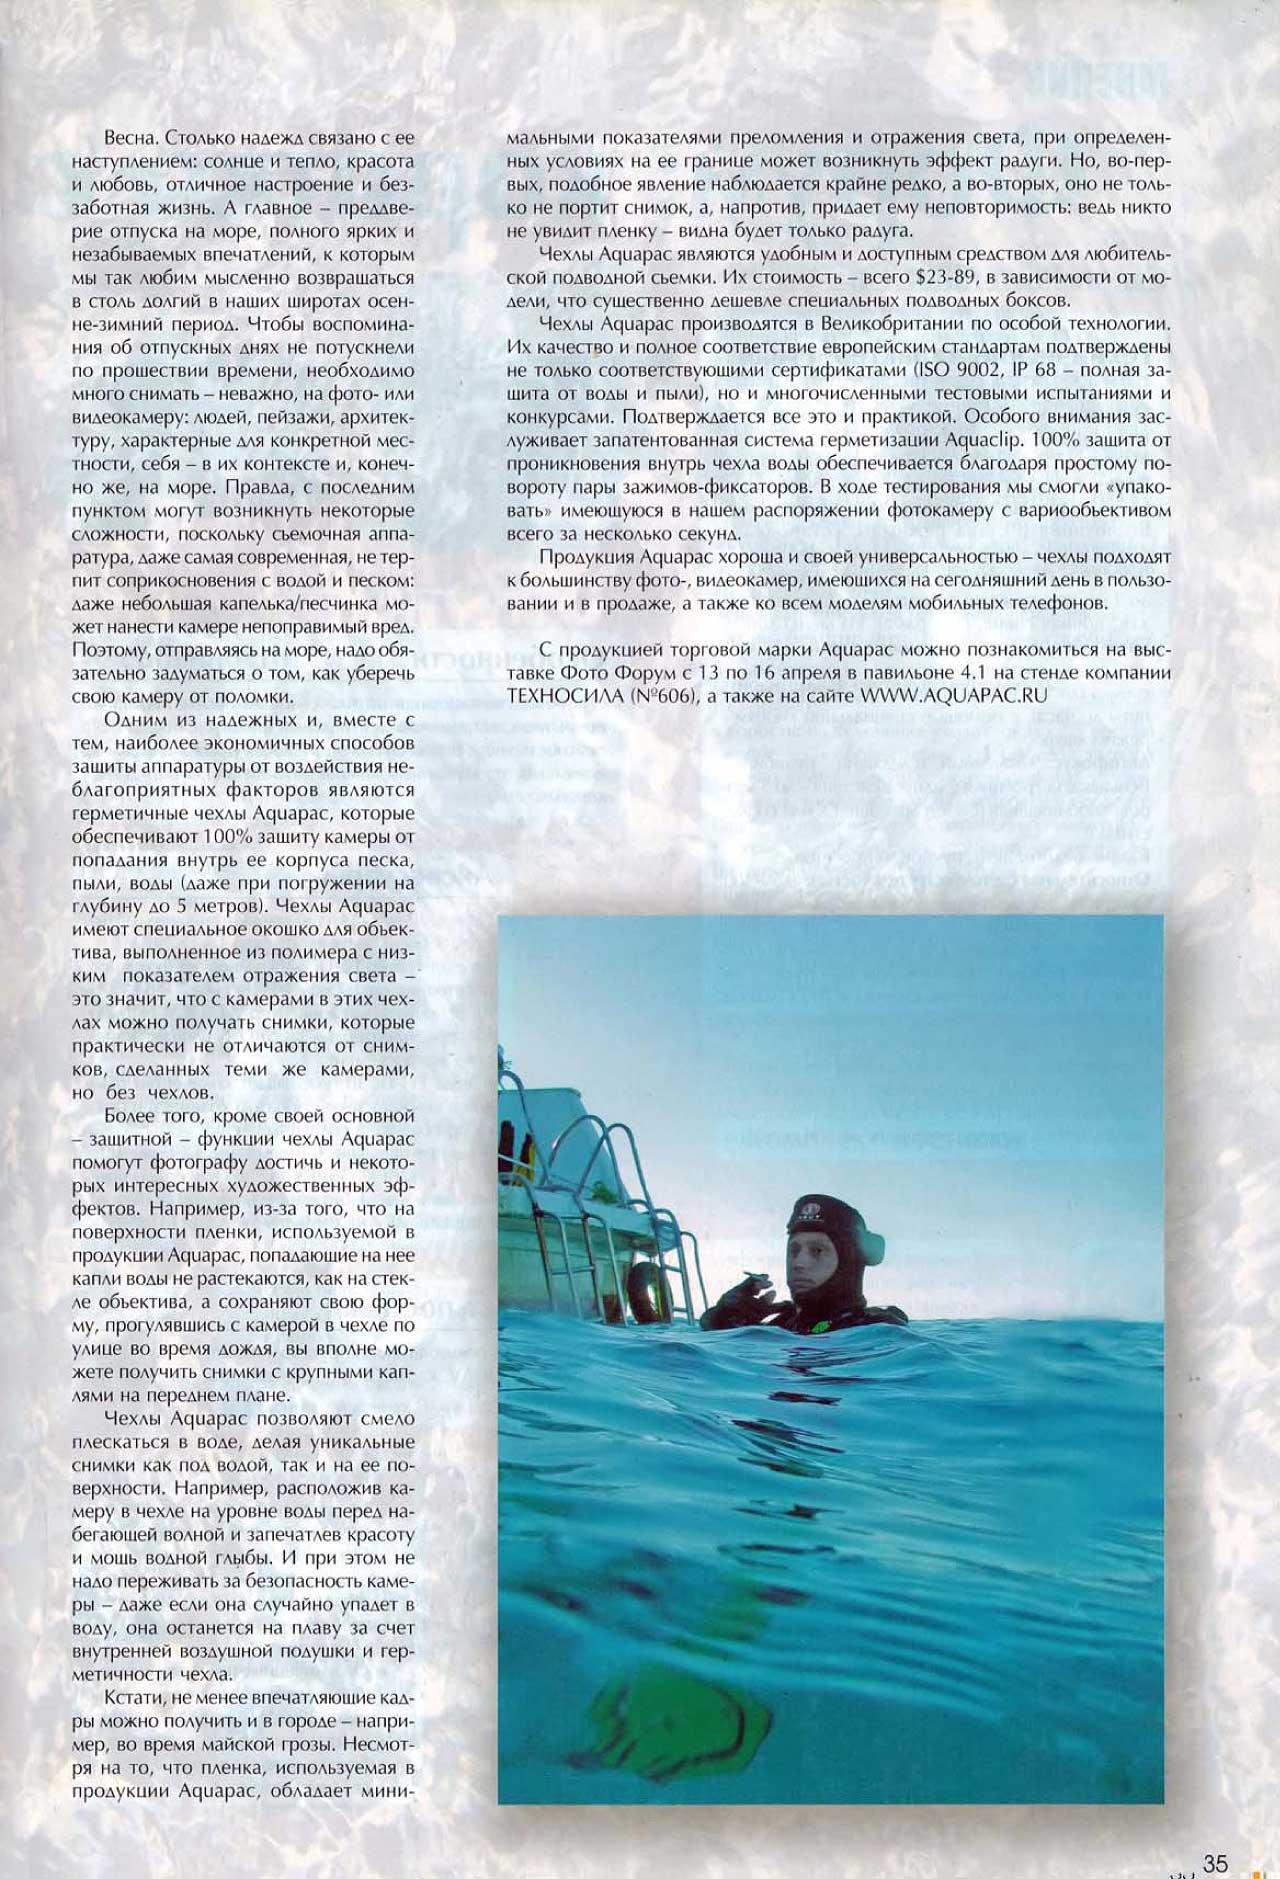 Aquapac - надежная защита фото- и видеокамер от превратностей судьбы